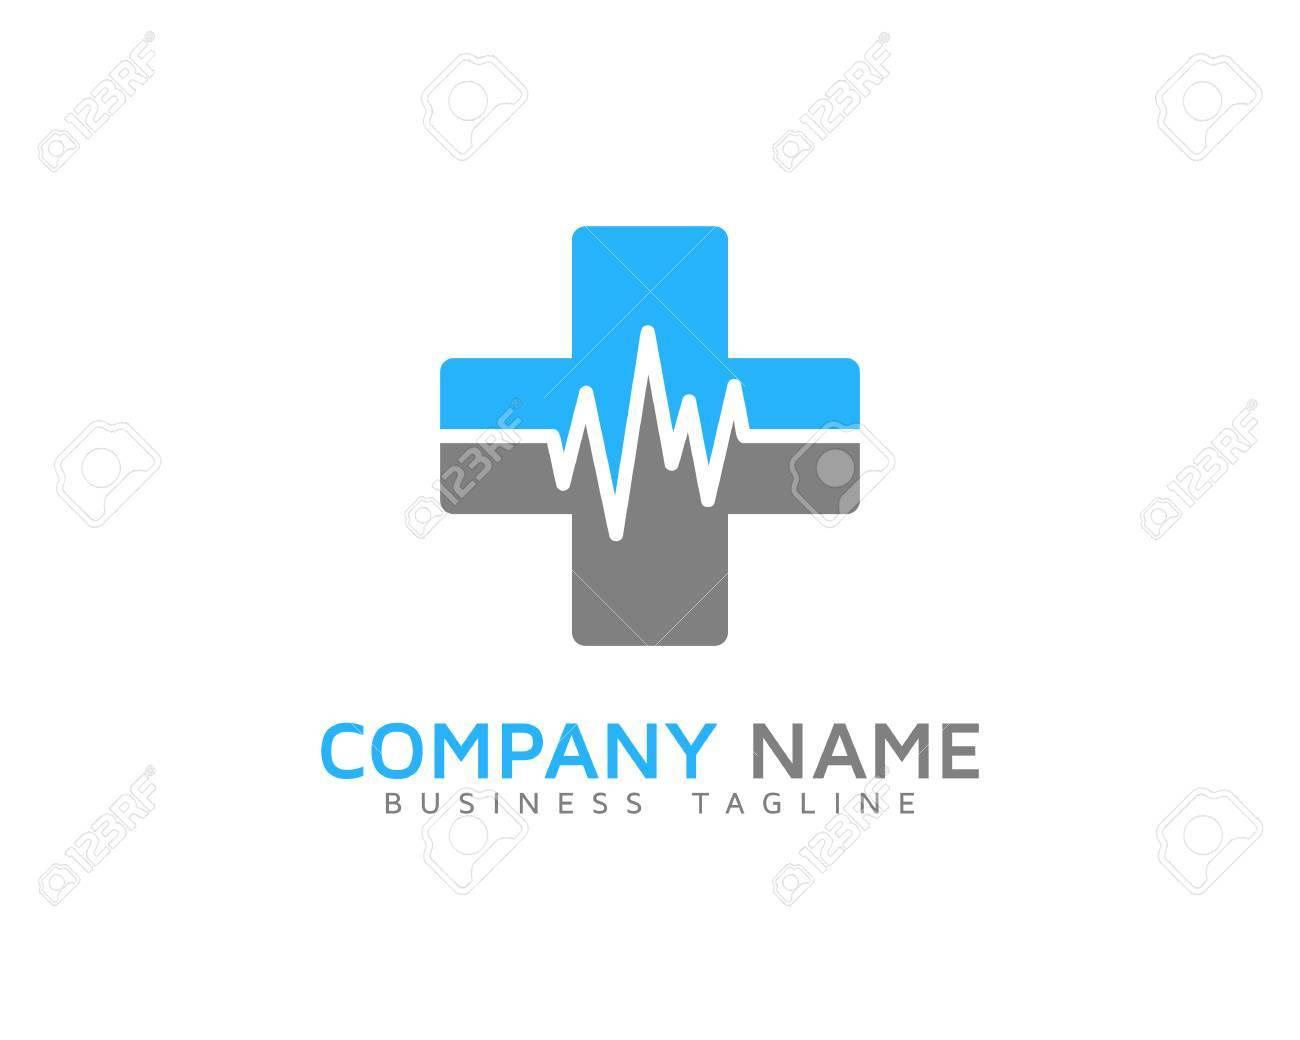 Medical clinic logo design template royalty free cliparts vectors medical clinic logo design template stock vector 70952262 biocorpaavc